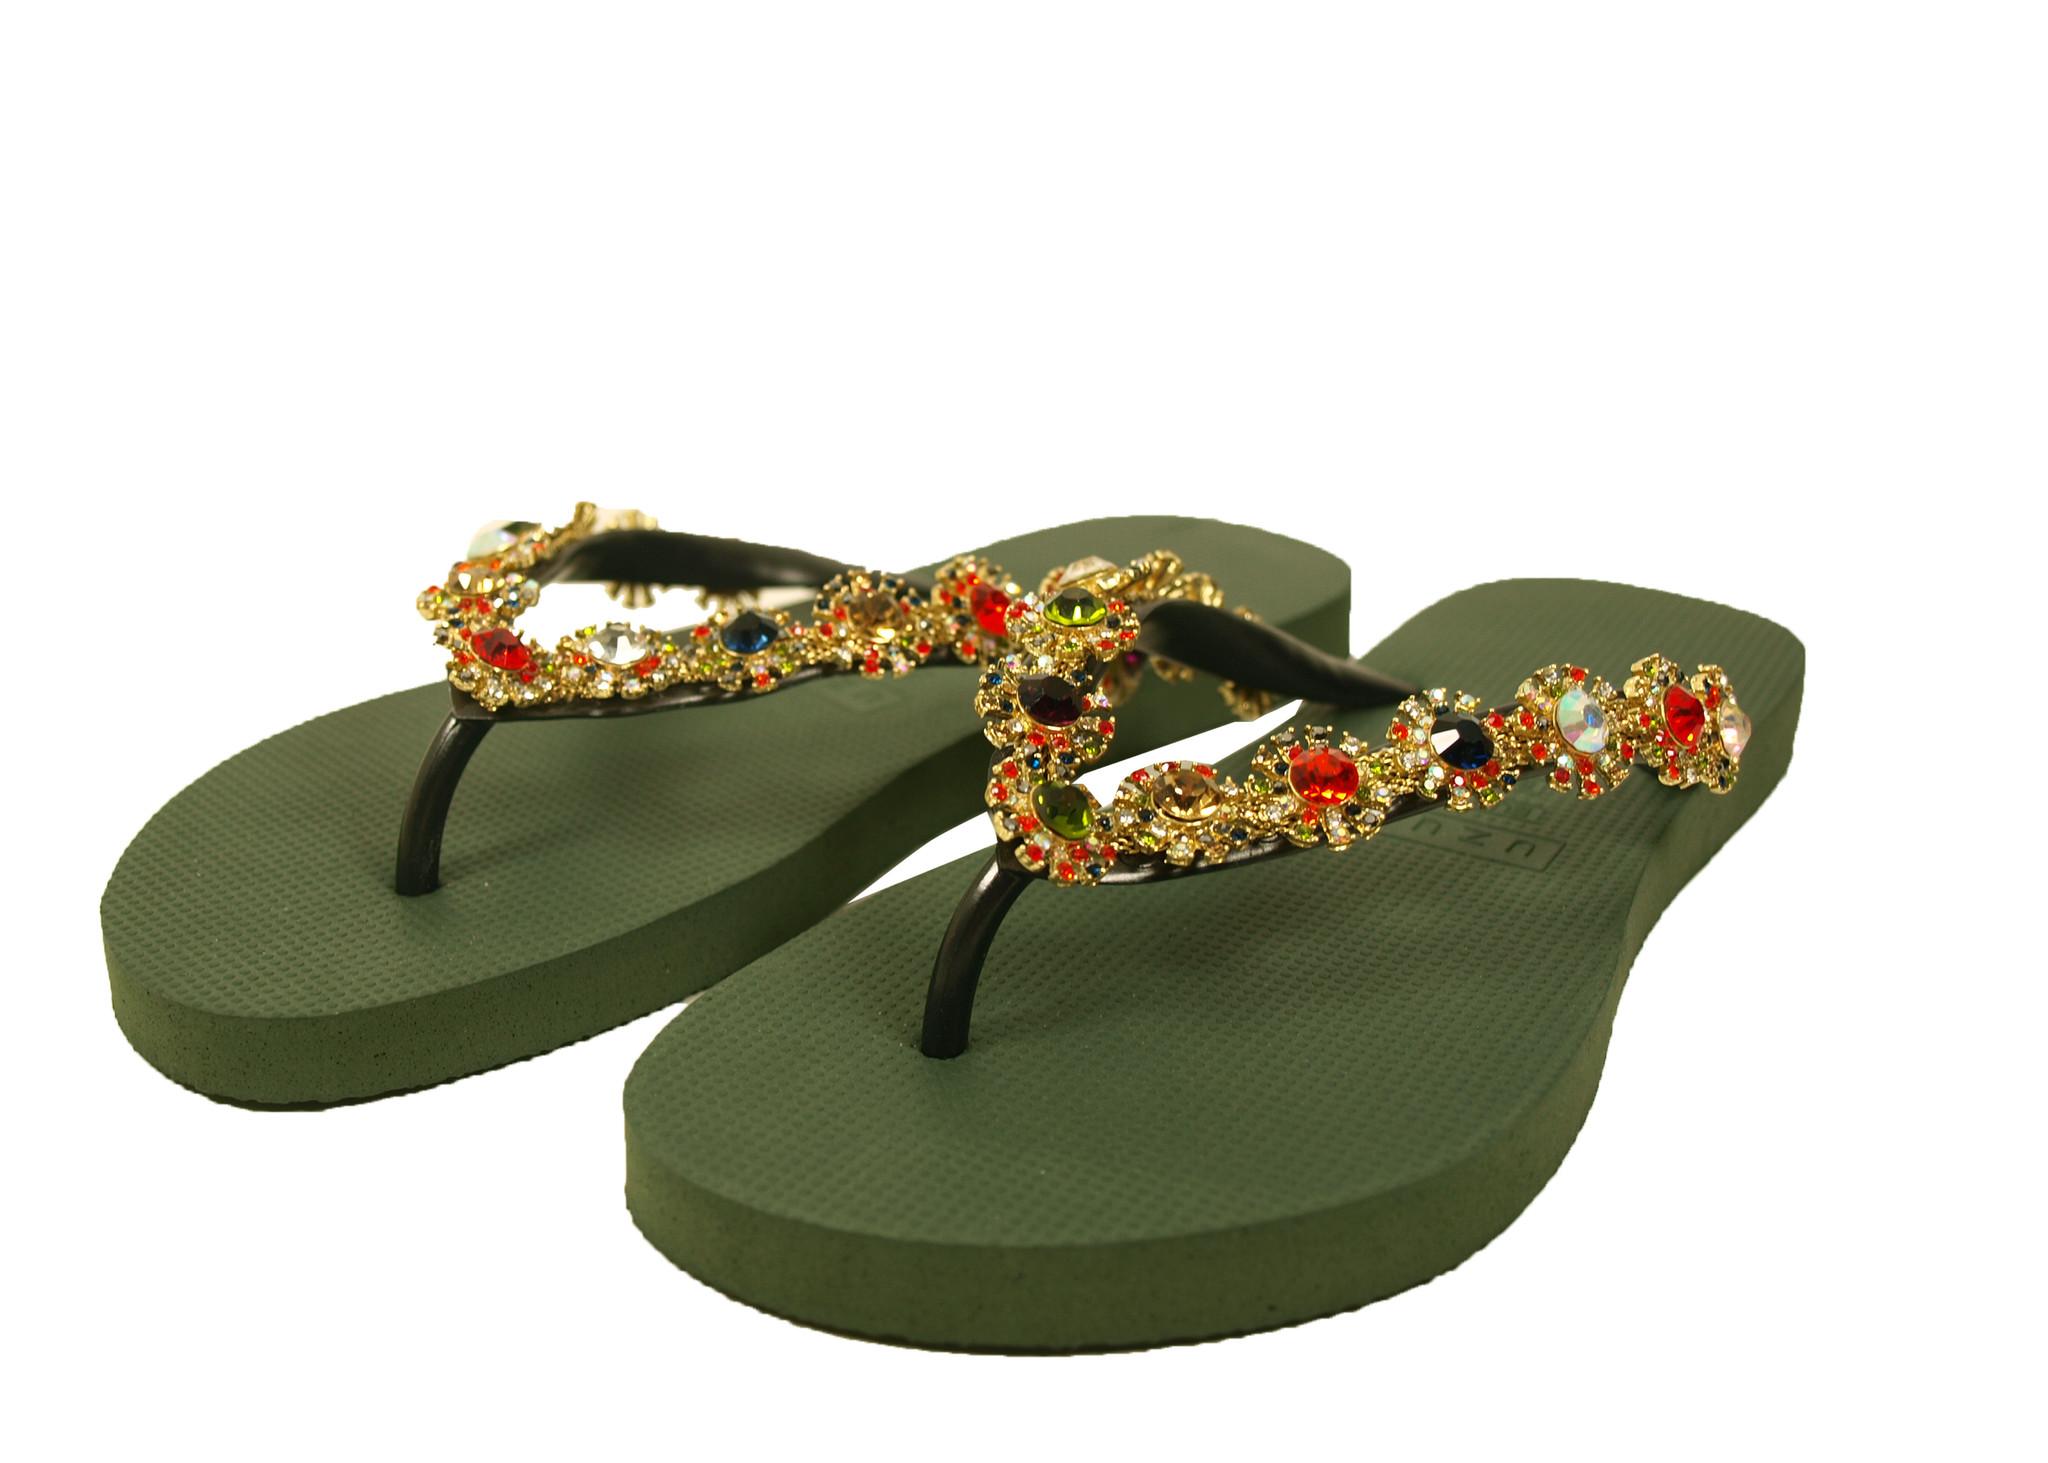 Uzurii Uzurii Luxury Slipper 18.097.08 Groen (Army Green) Colorful Diana